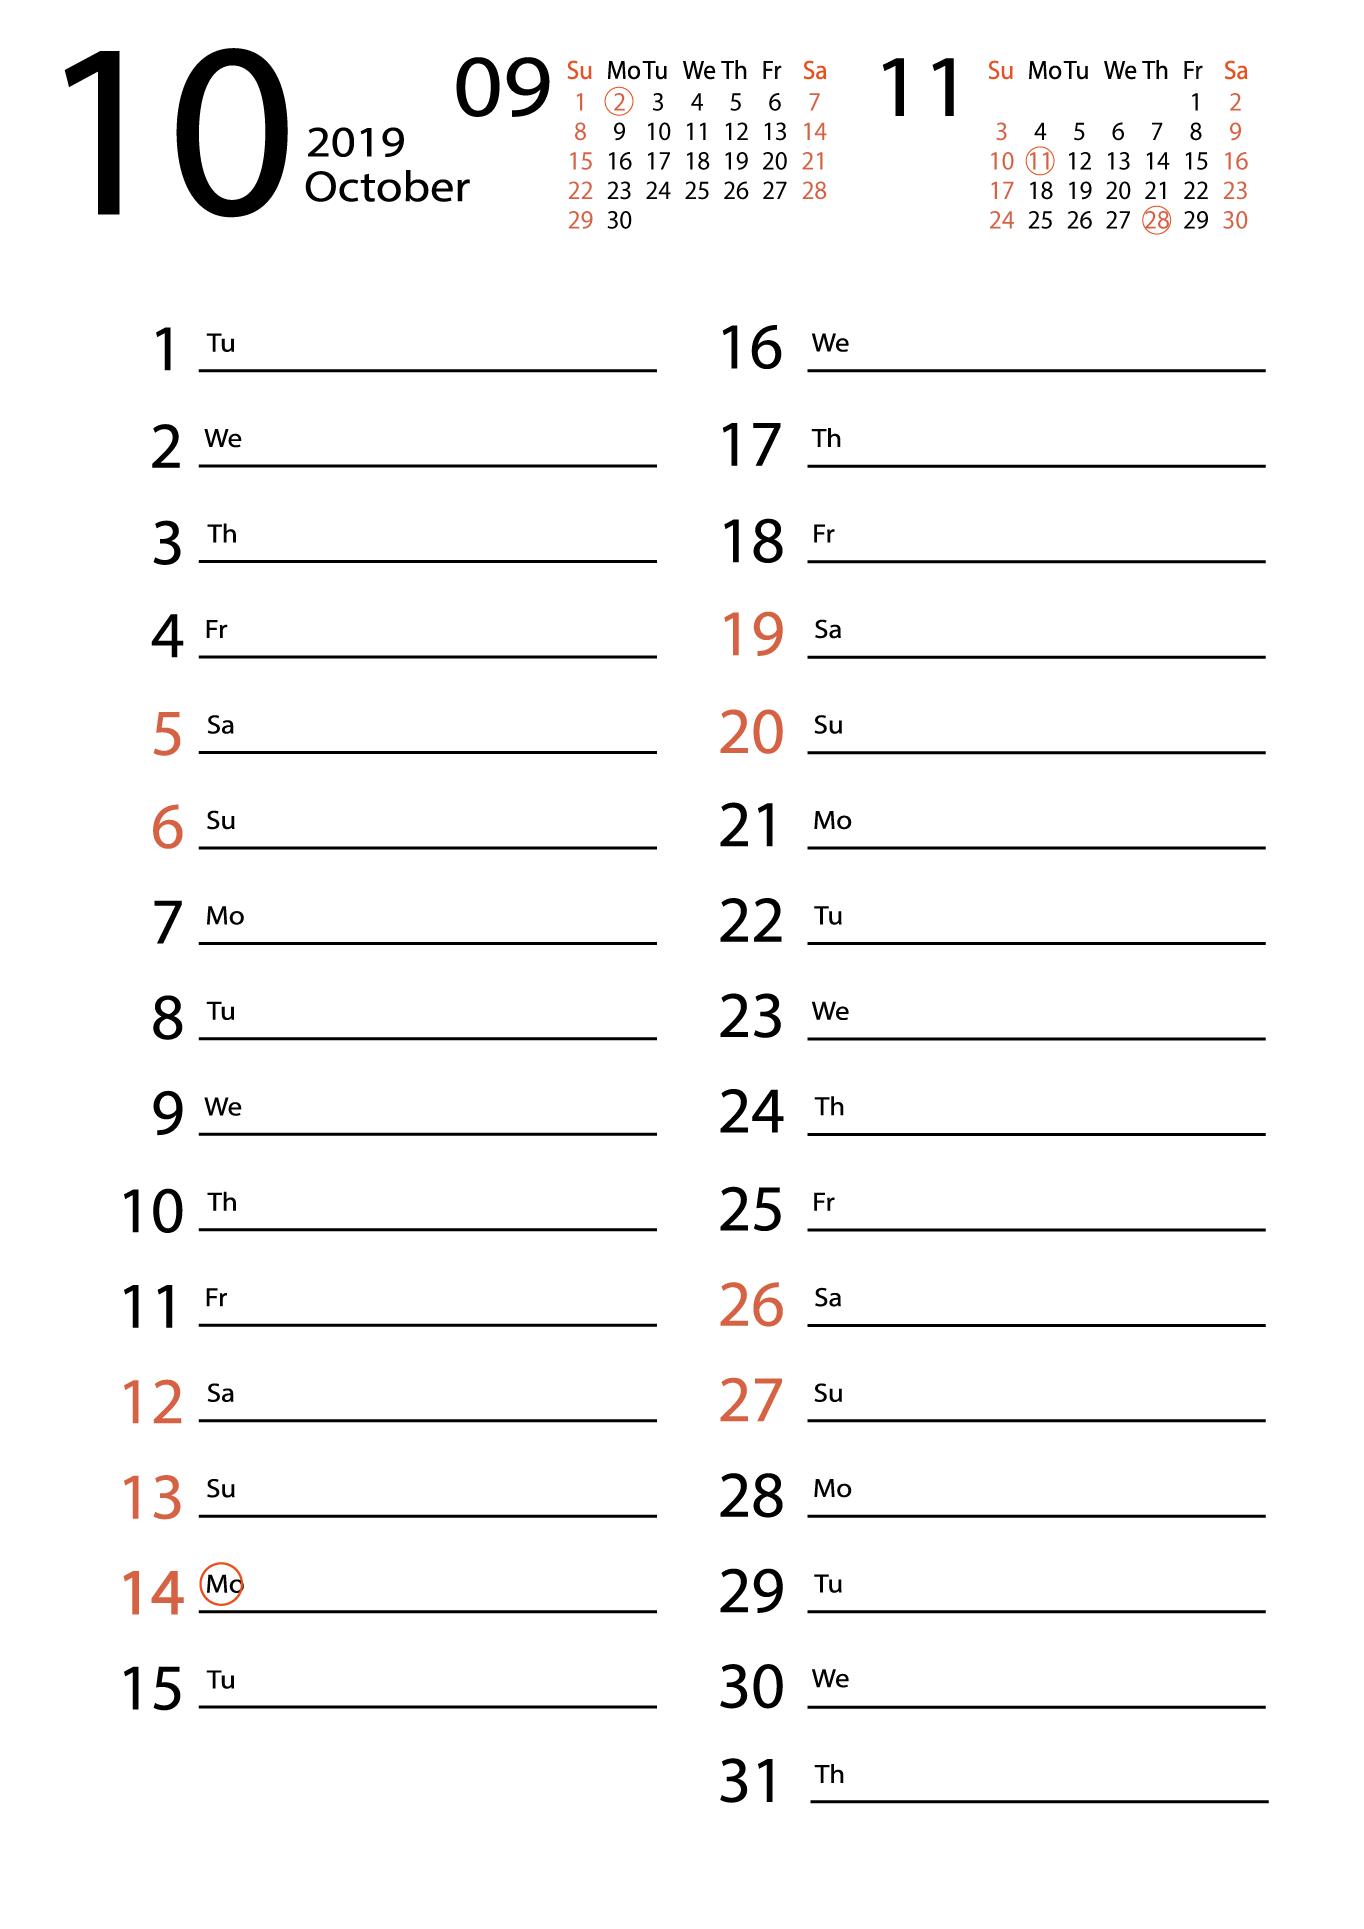 October 2019 calendar for notes